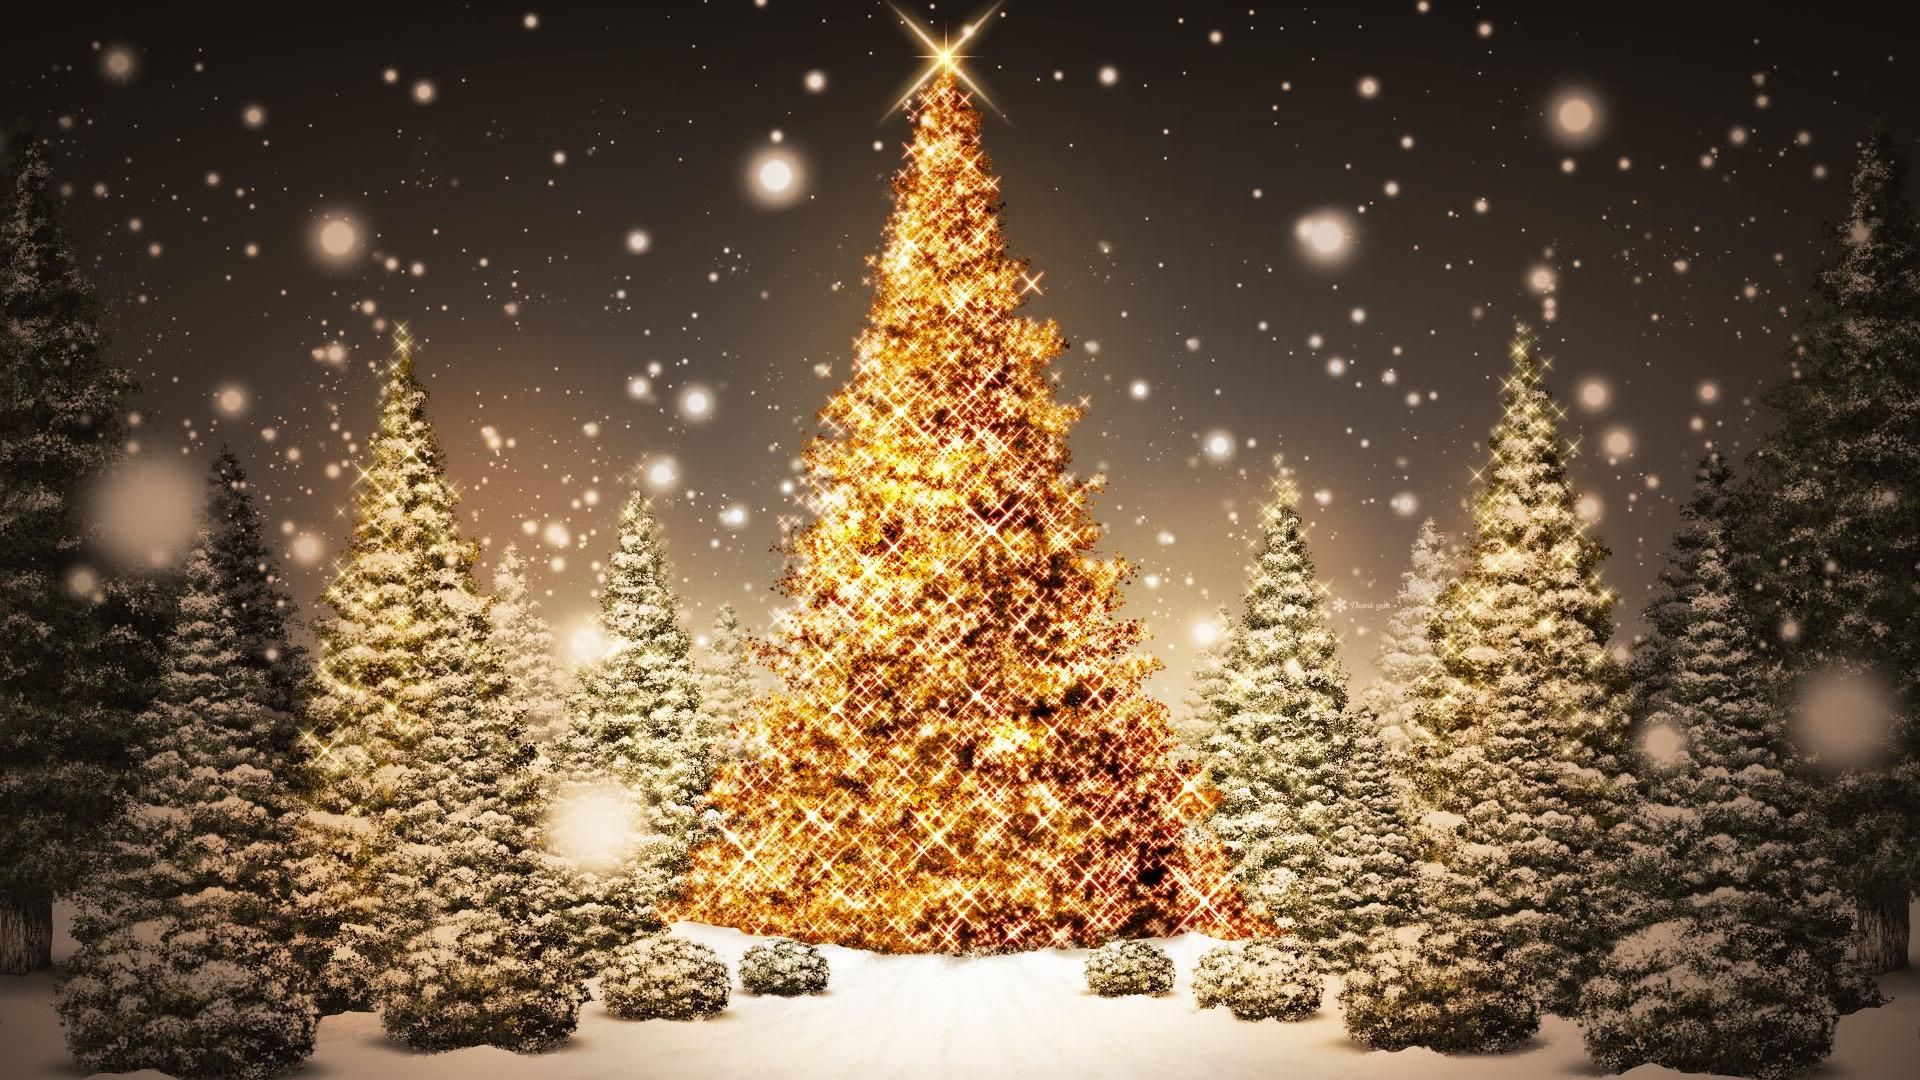 christmas tree hd wallpapers cool desktop images widescreen